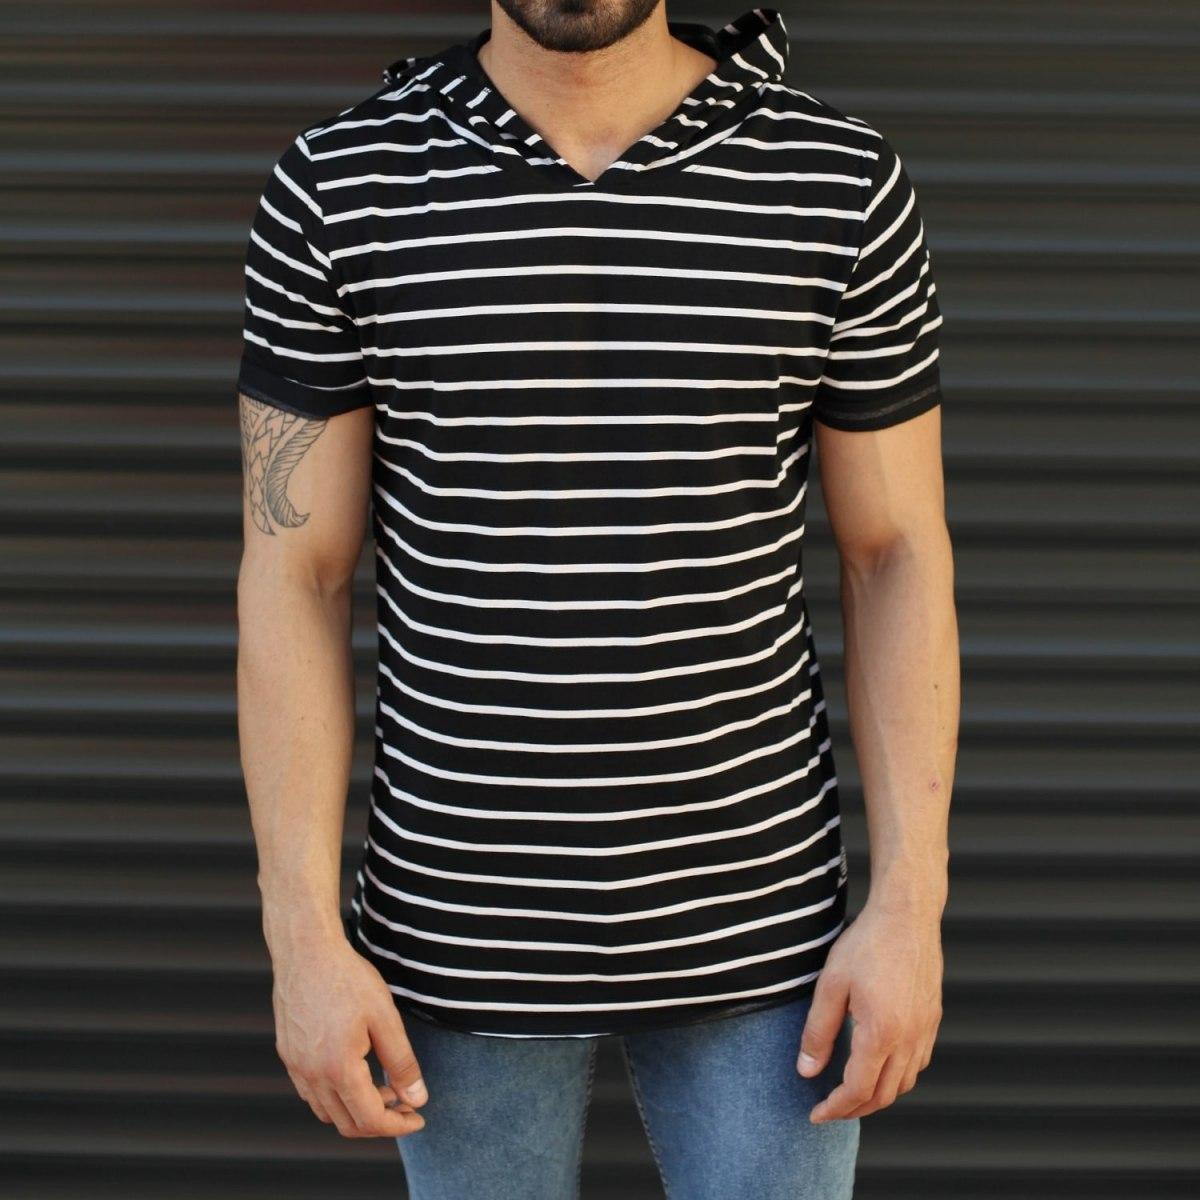 Men's Hooded Longline Striped T-Shirt Black Mv Premium Brand - 1